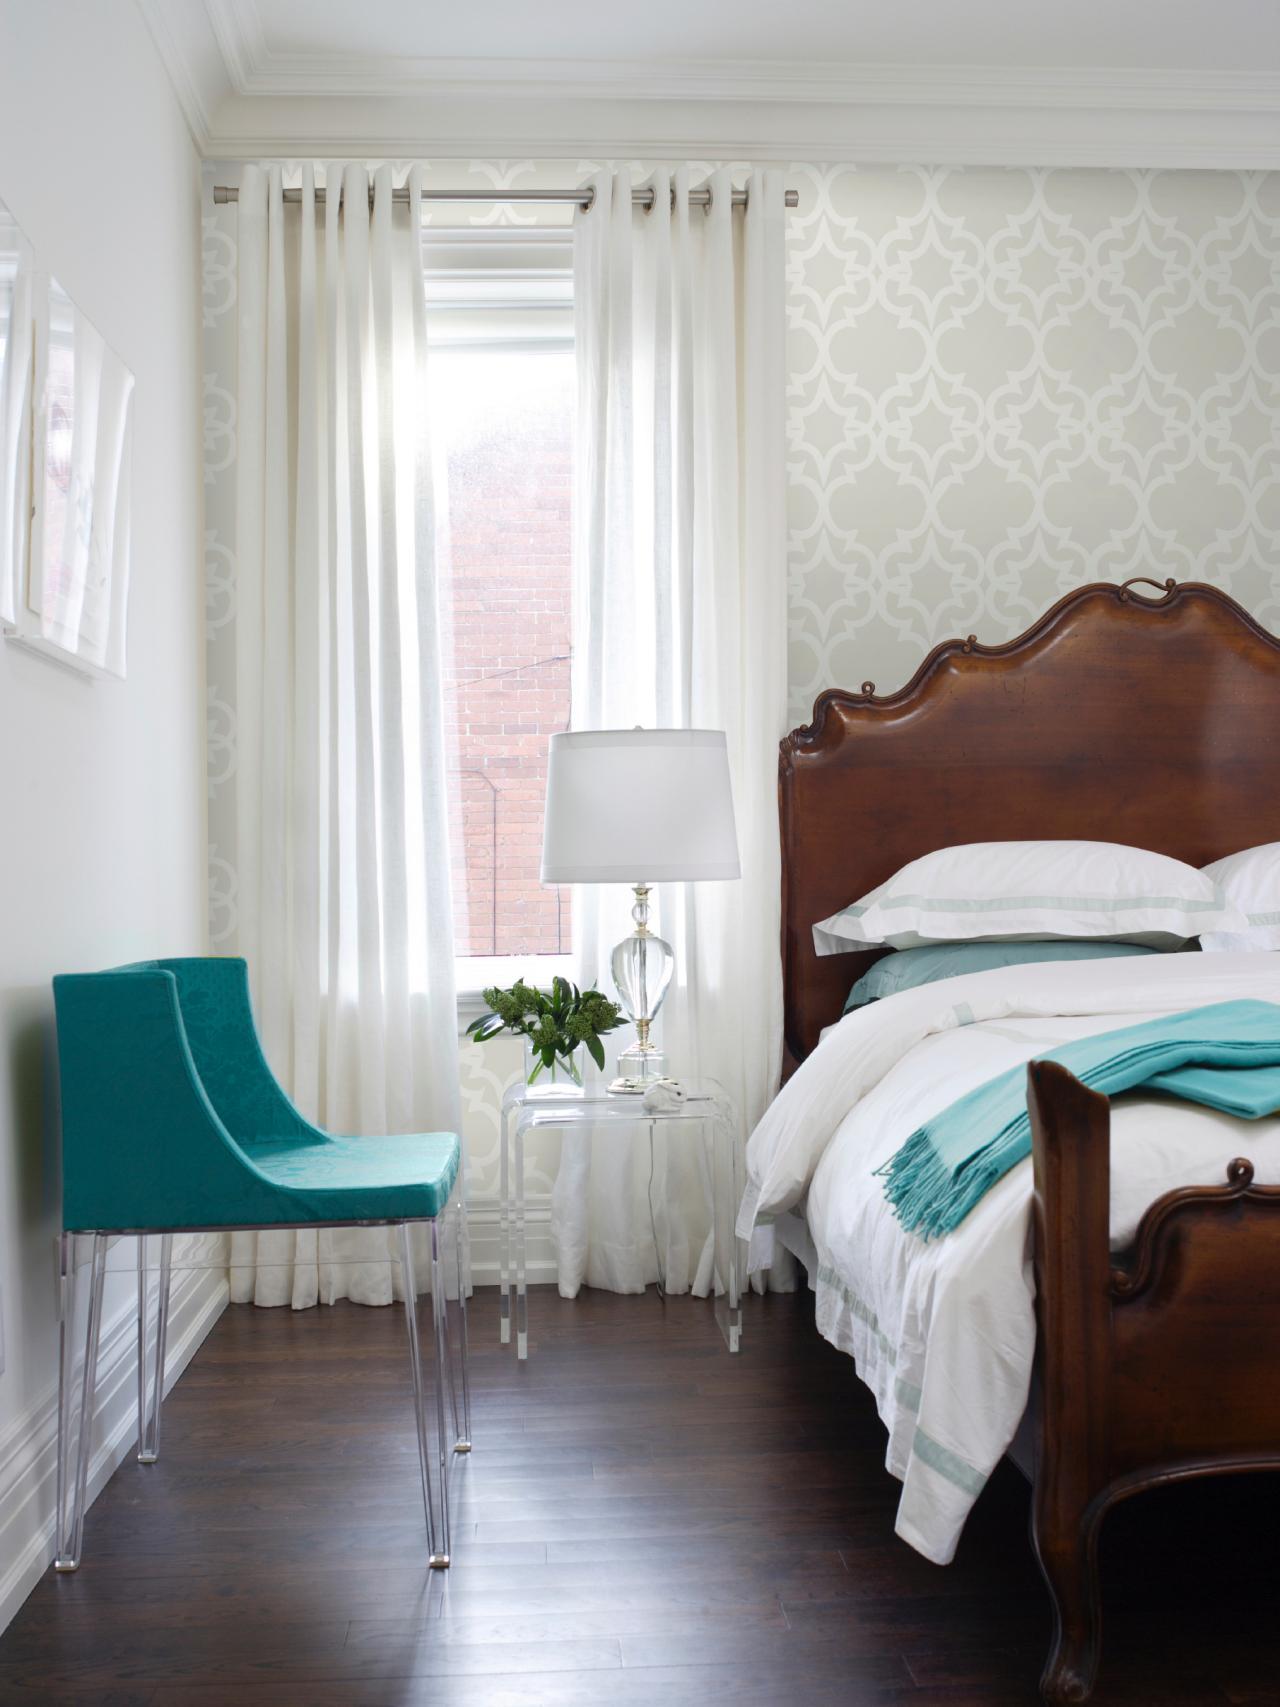 Budget Bedroom Ideas Bedrooms Bedroom Decorating Ideas HGTV 1280x1707